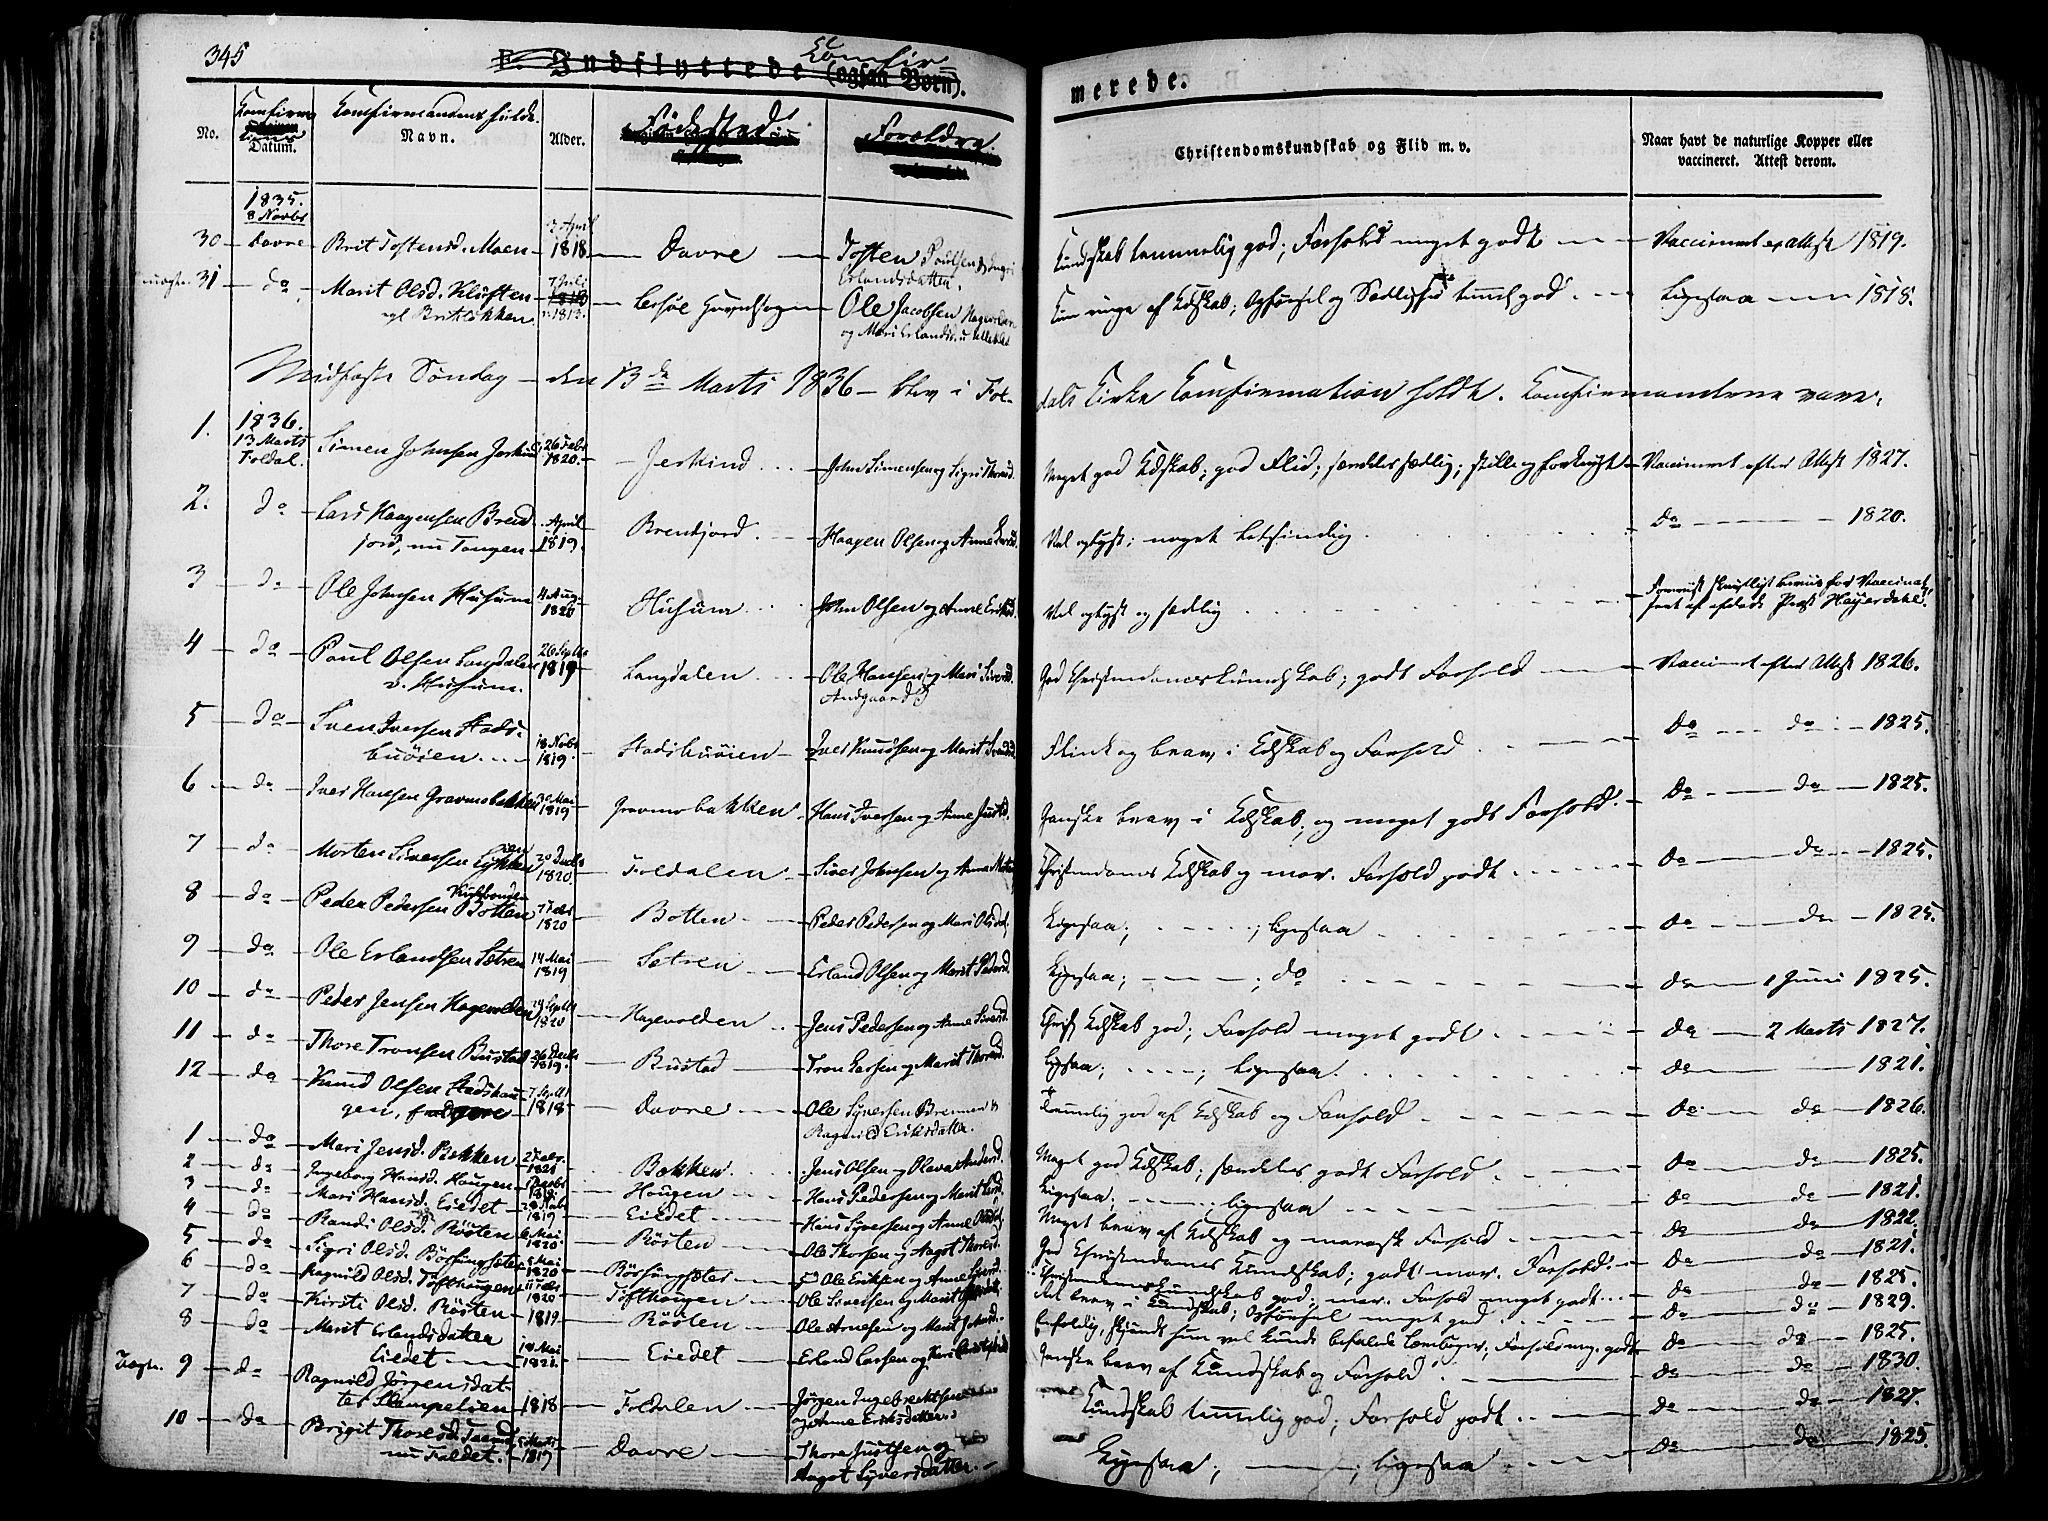 SAH, Lesja prestekontor, Ministerialbok nr. 5, 1830-1842, s. 345